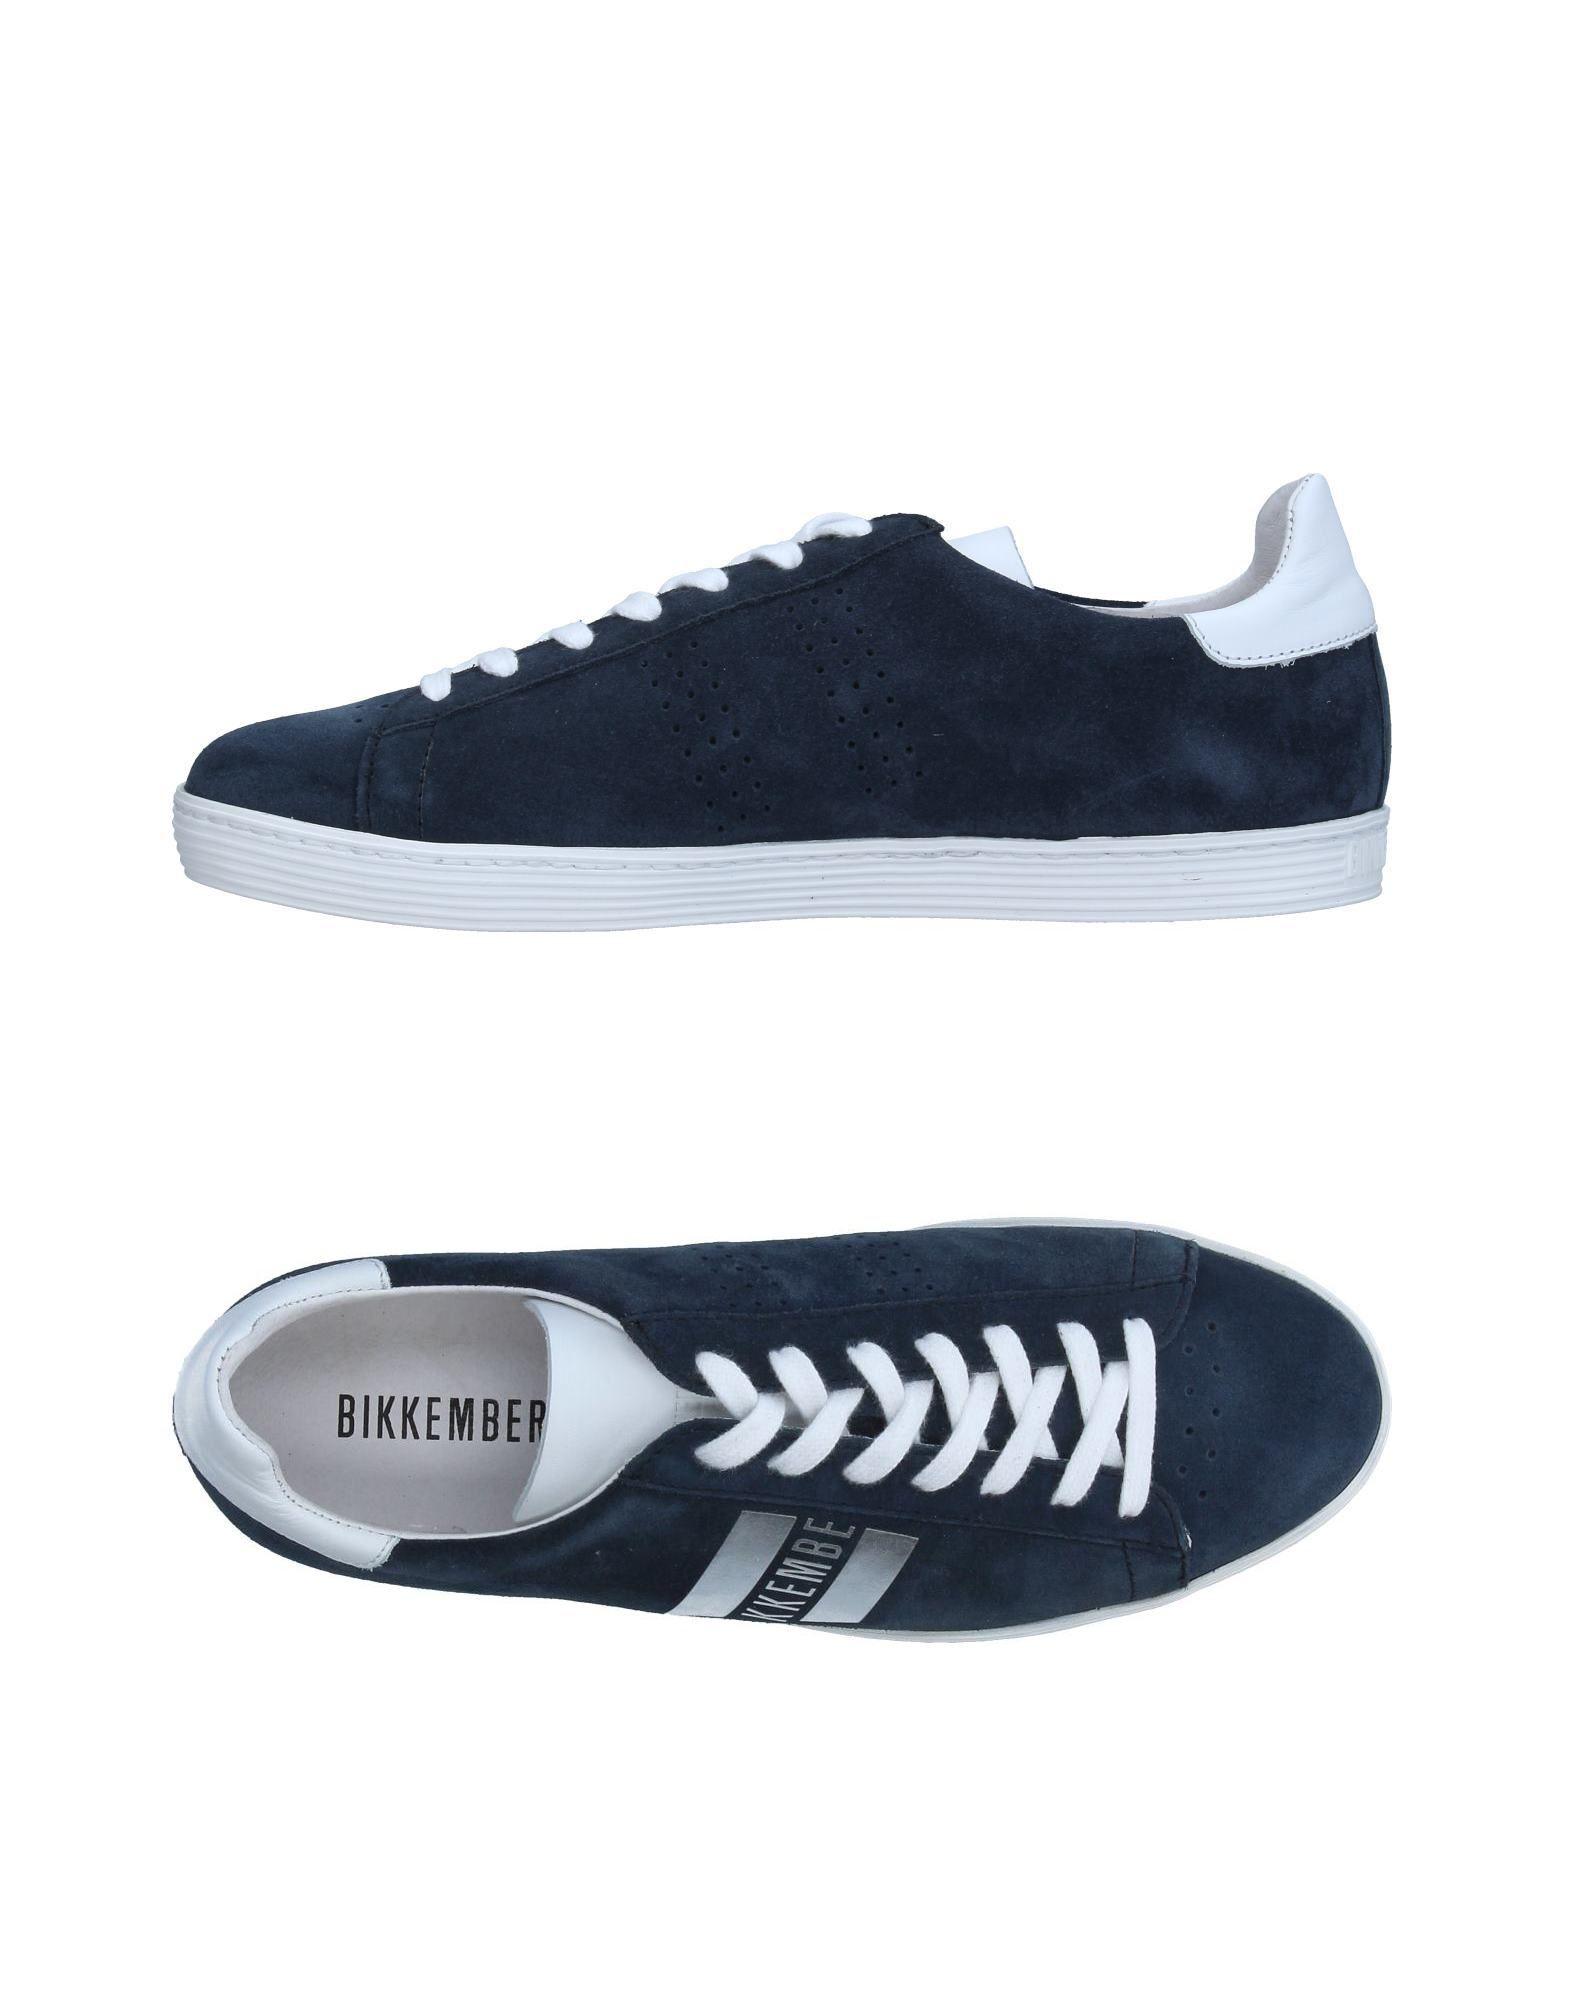 Sneakers Bikkembergs Uomo - 11332788IK elegante